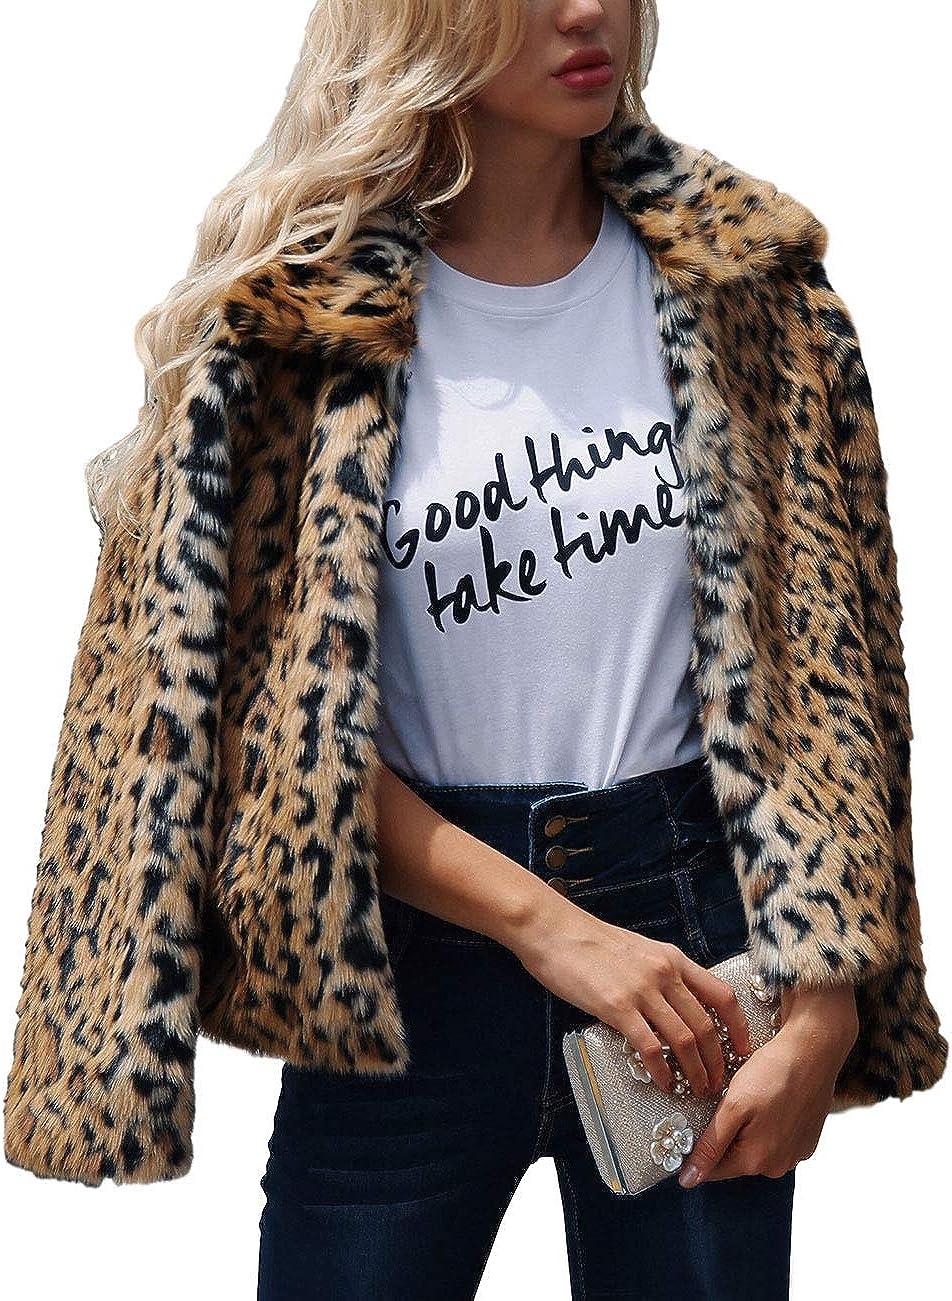 ZLSLZ Womens Ladies Cute Leopard Lapel Luxury goods Faux Fur Long Even Sleeve Mesa Mall